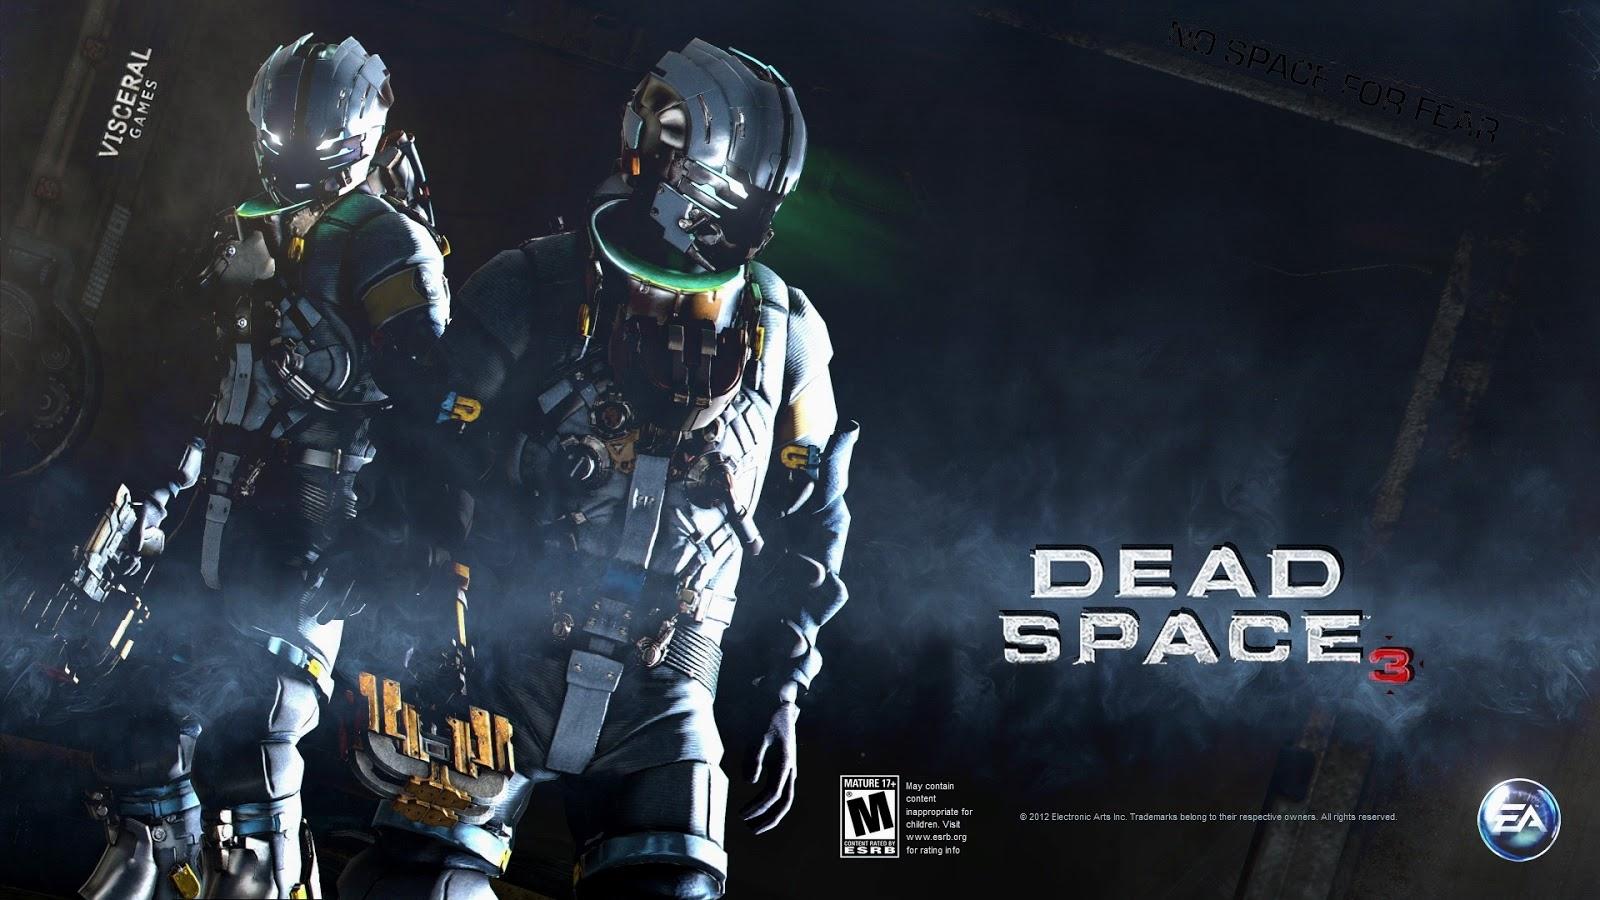 Dead Space 3 Game Wallpaper HD